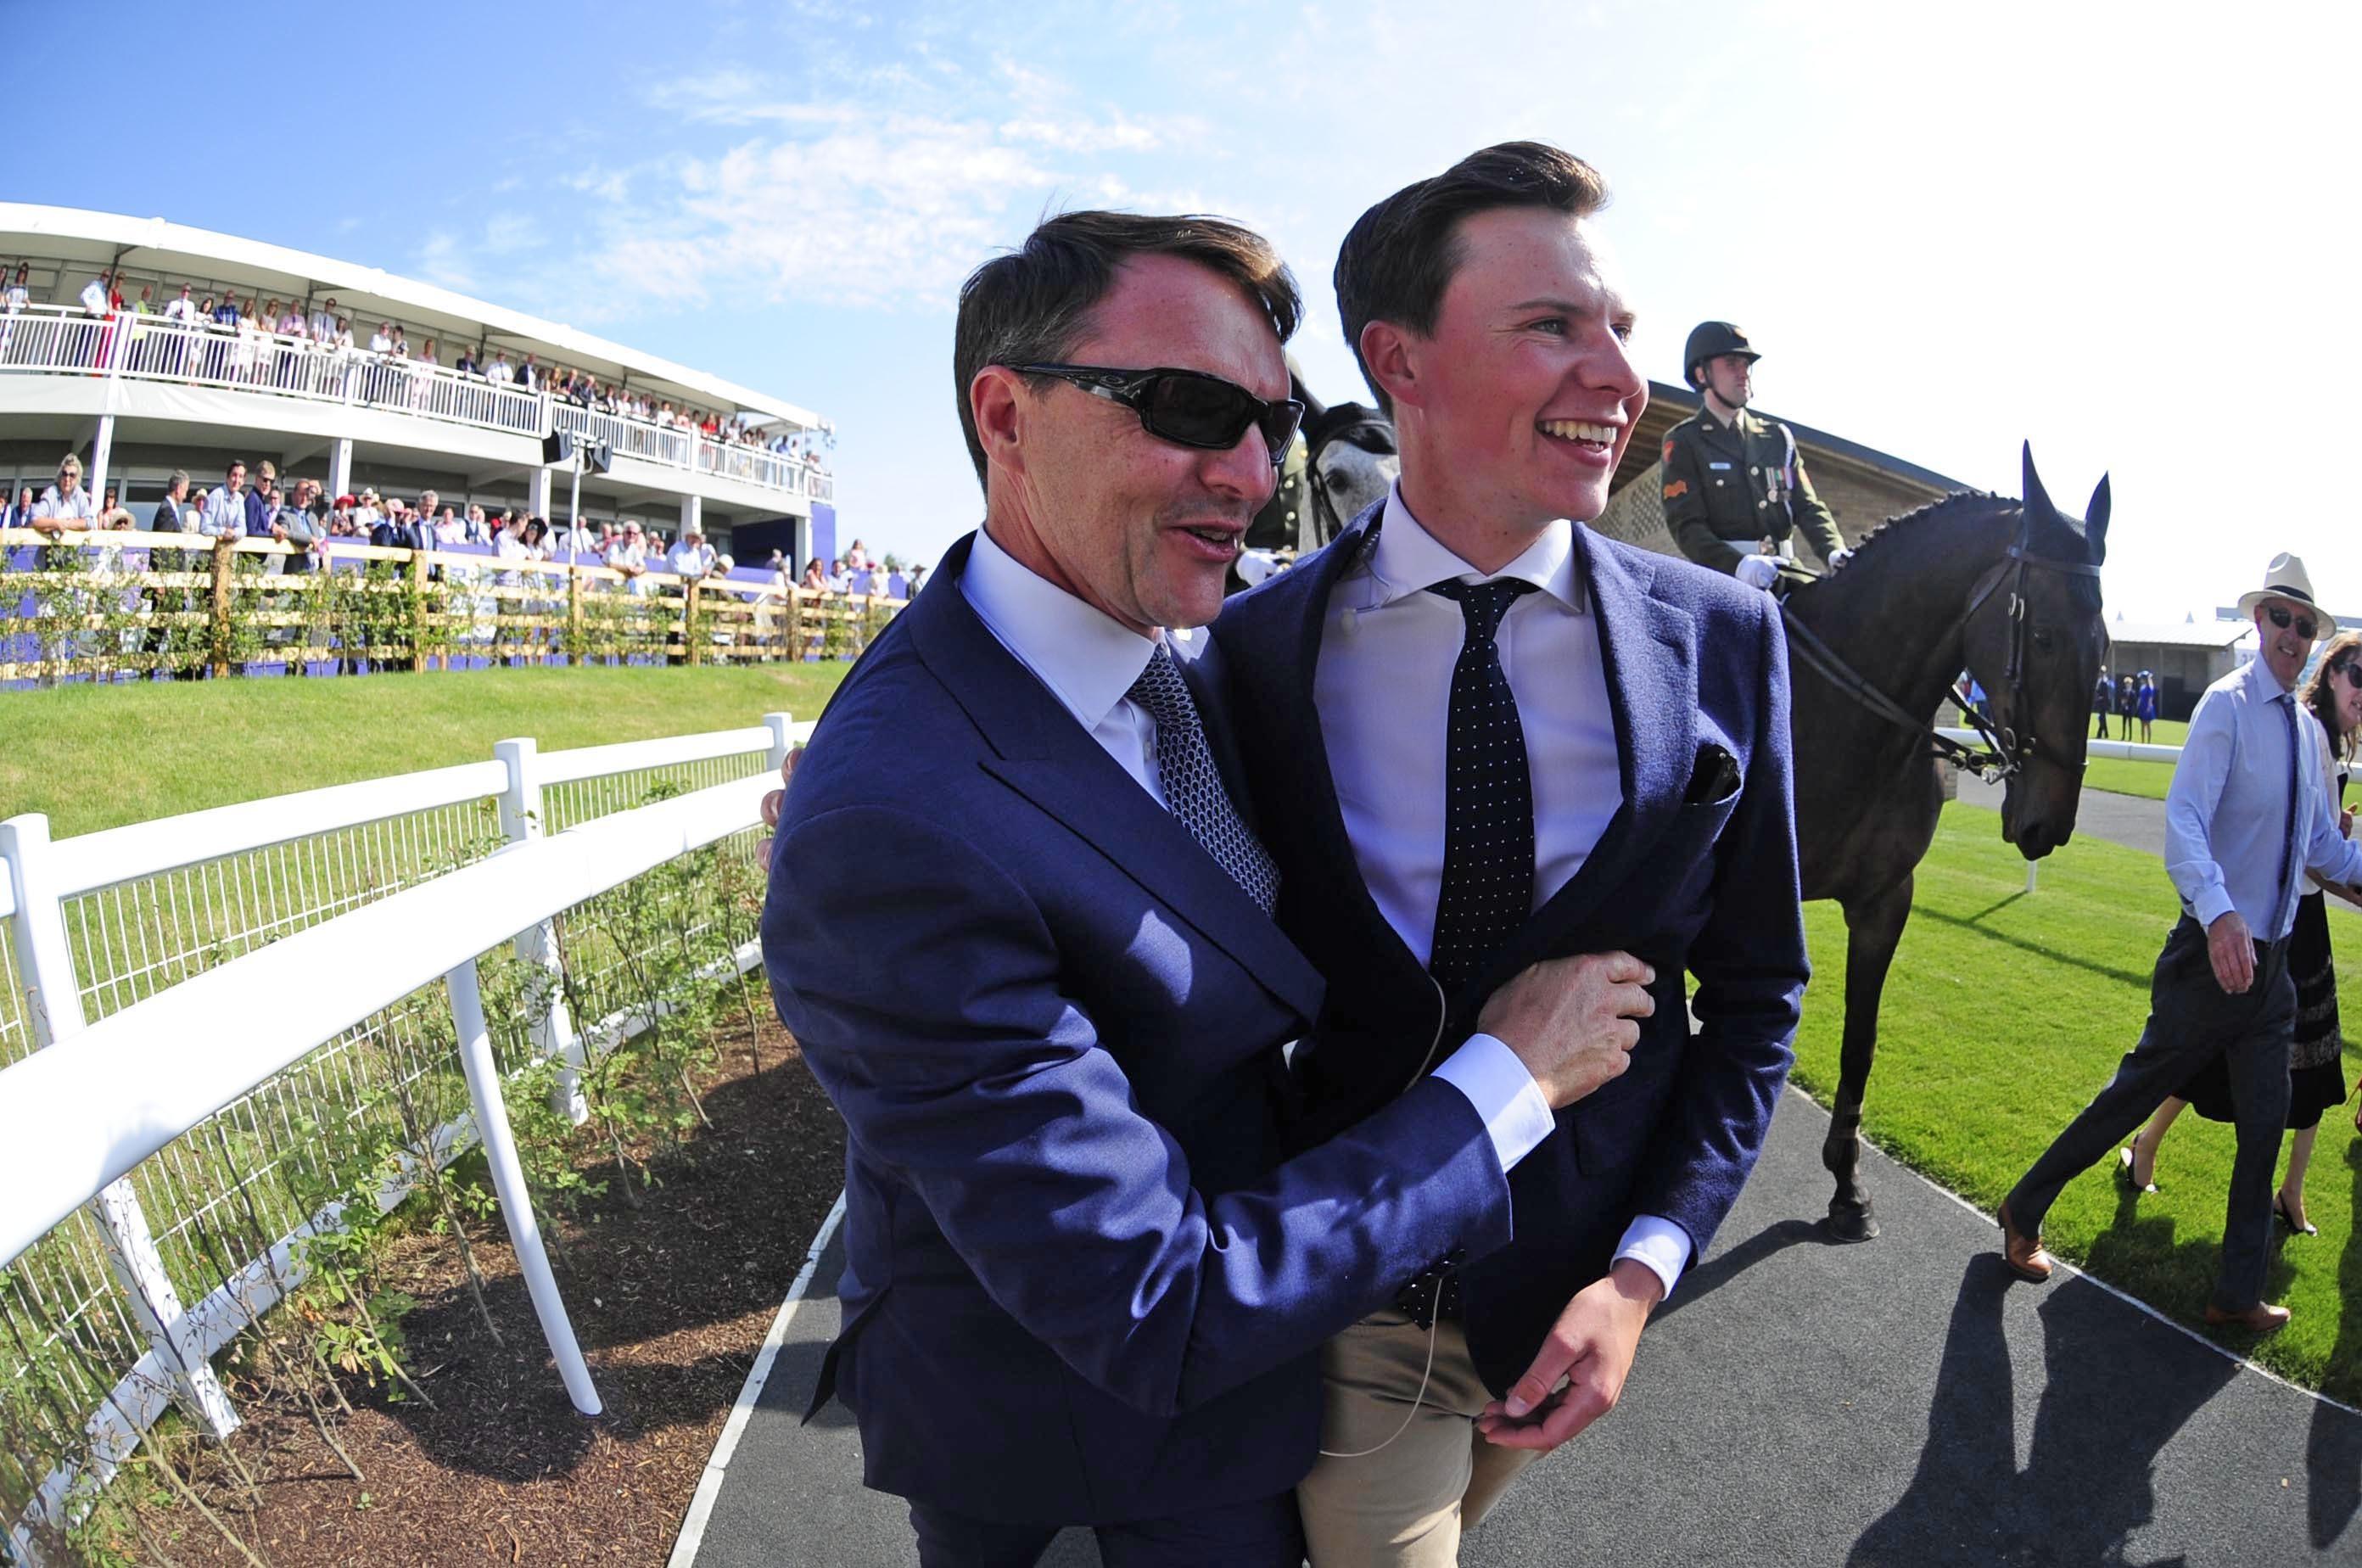 Aidan O'Brien congratulates his son Joseph after the Irish Derby